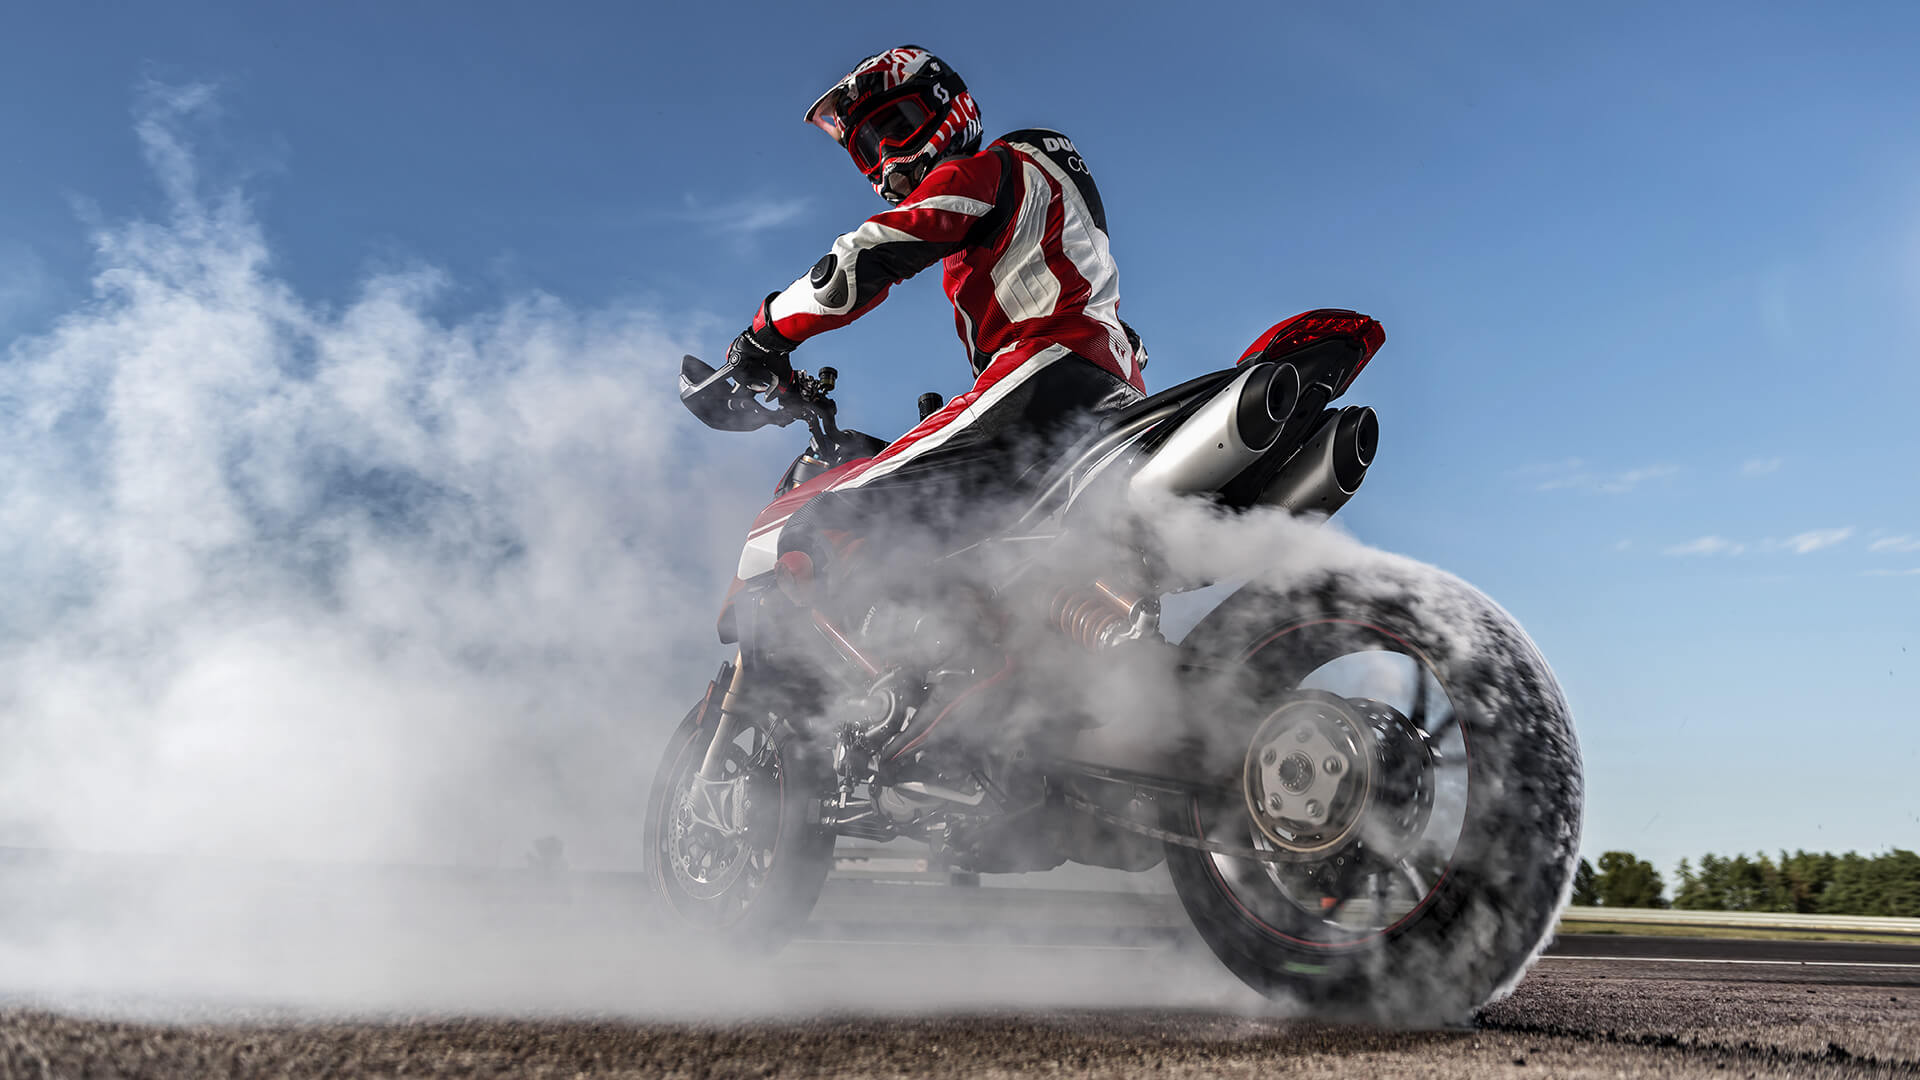 Ducati Hypermotad 950 SP